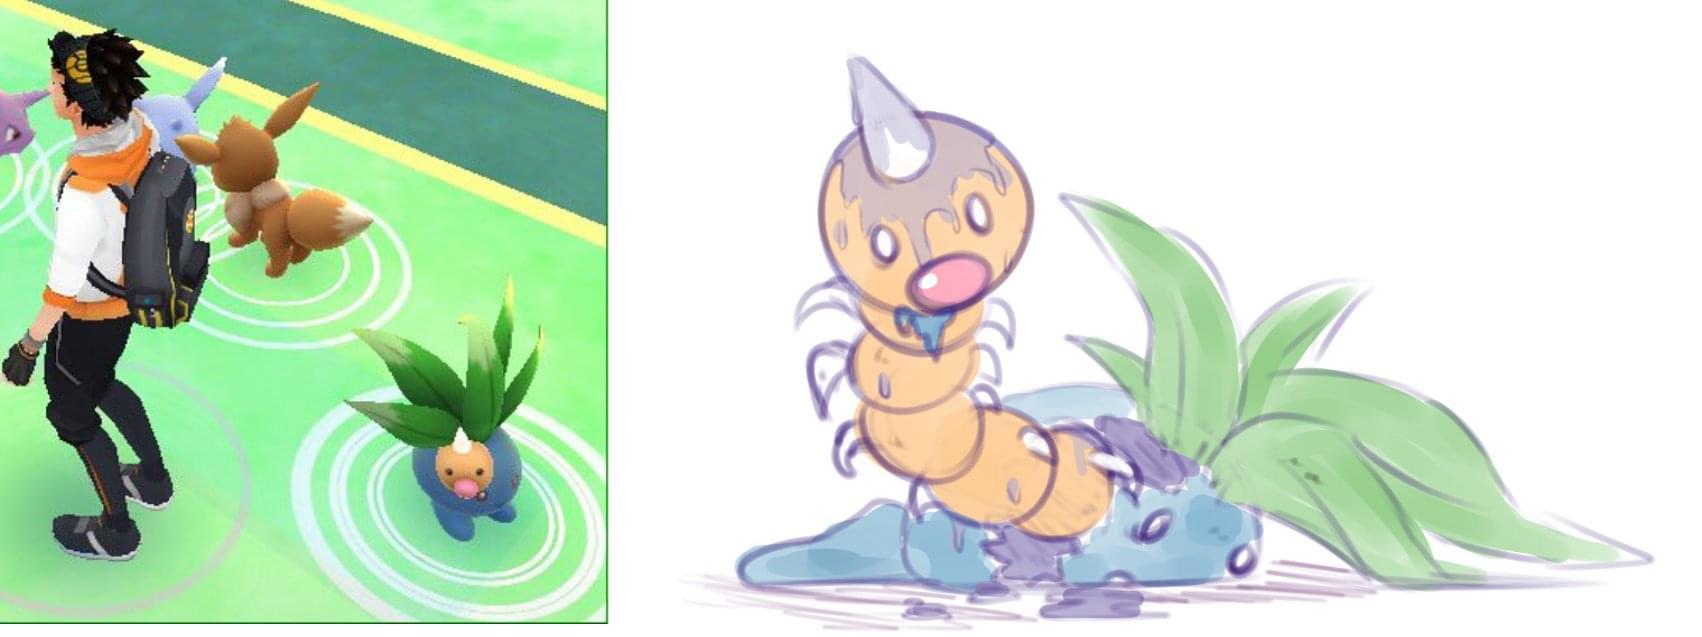 Glitch clipart gress  Art This Pokemon May